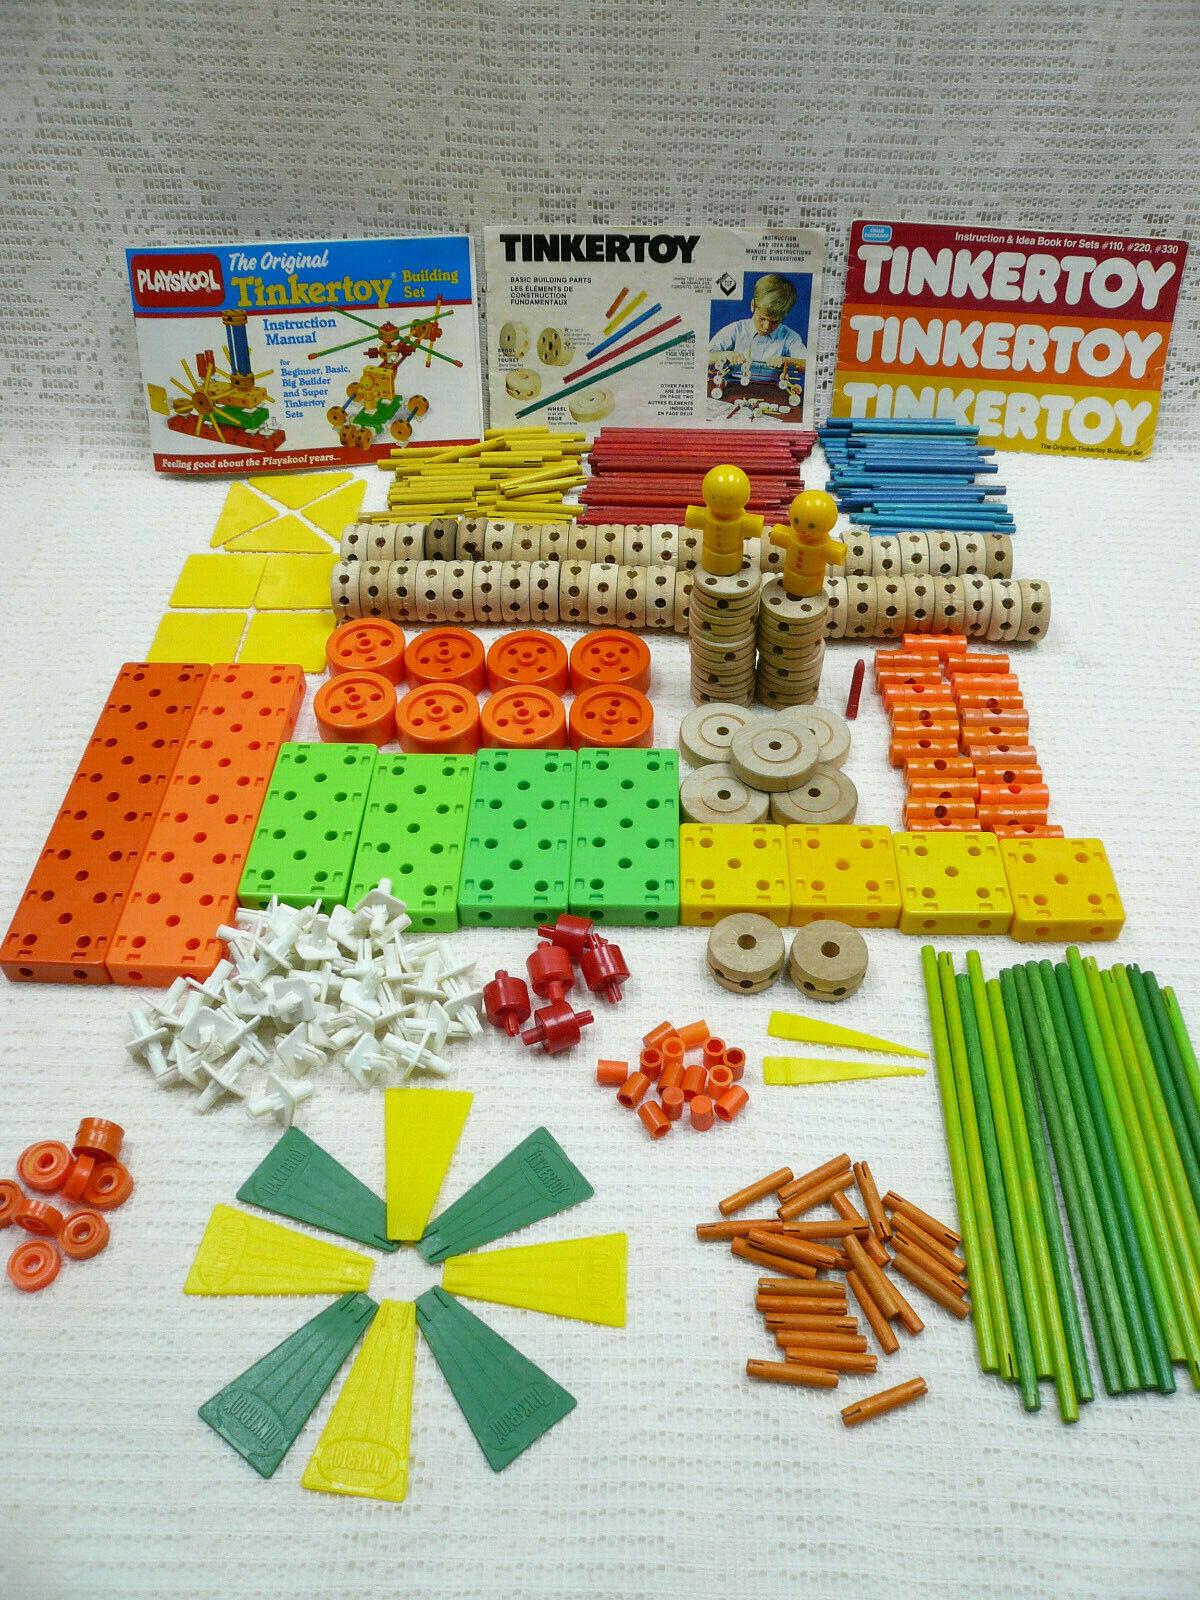 Vtg Lot Tinker Toys 351 Pieces Wood Plastic Tinkertoy Retro Building Set Manuals